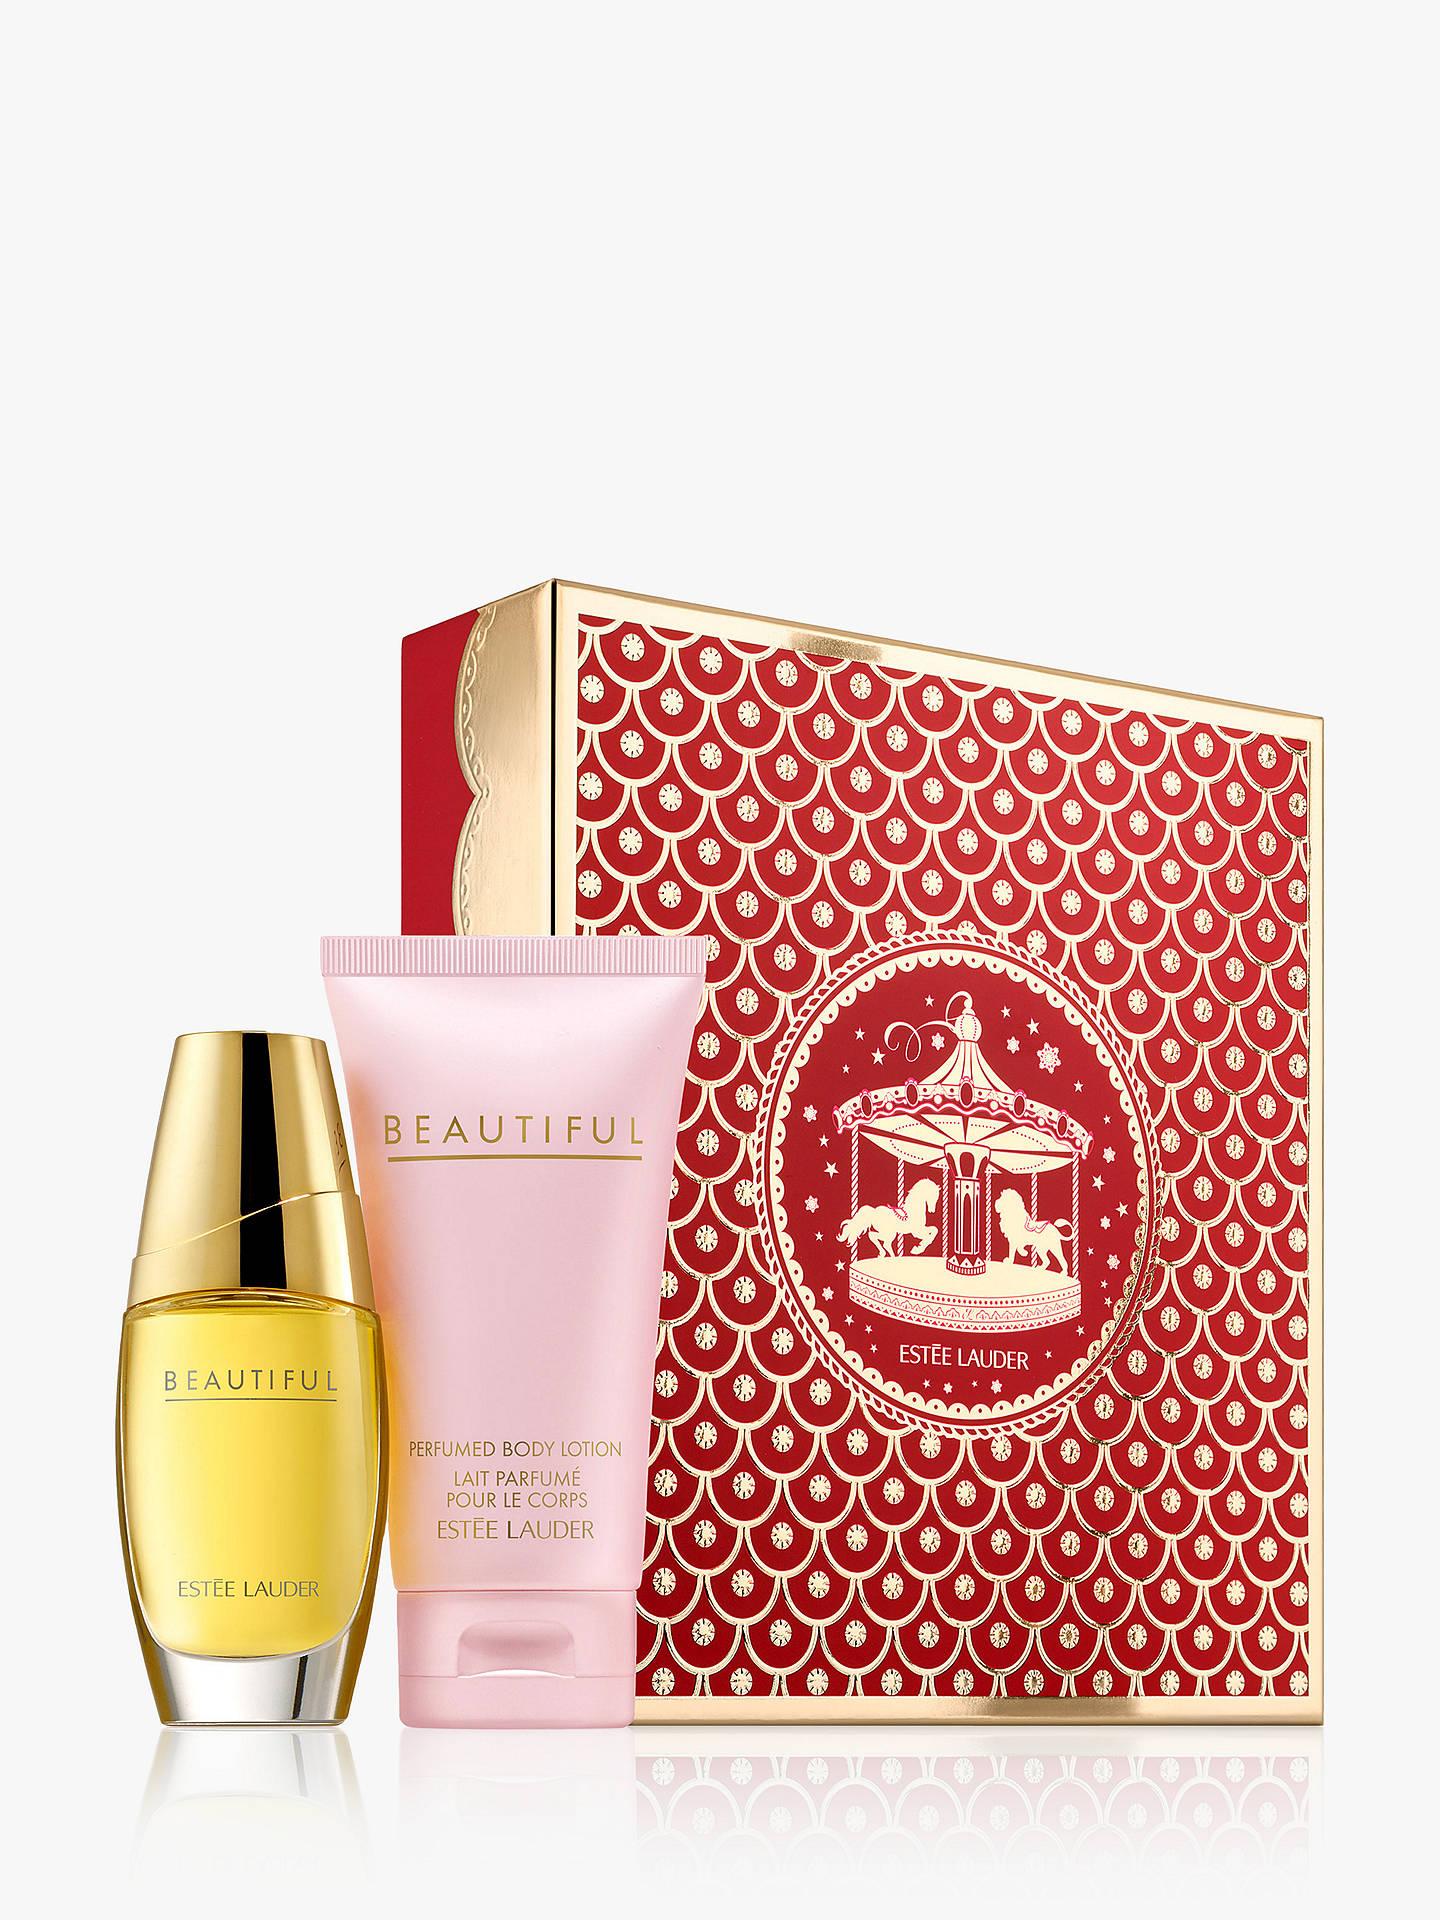 Este Lauder Beautiful 30ml Eau De Parfum Fragrance Gift Set At John Estee Women 75ml